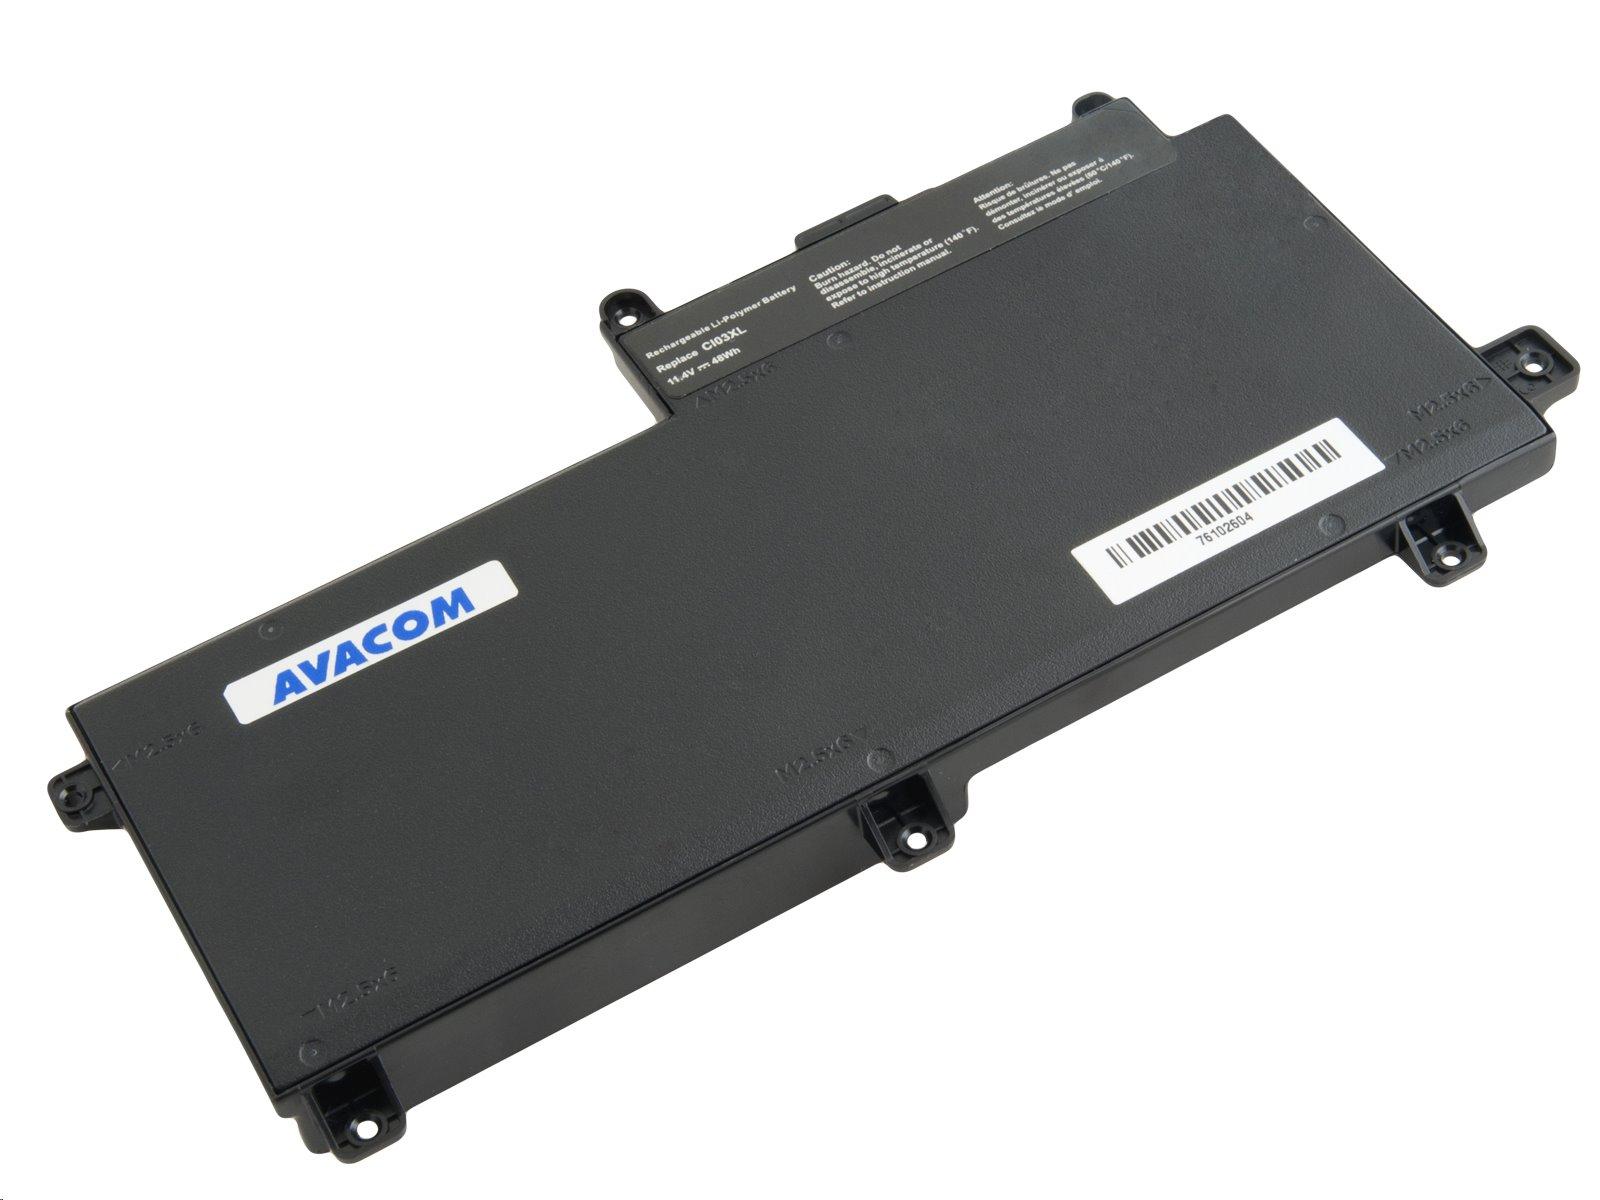 AVACOM baterie - HP ProBook 640 G2, 655 G2 Li-Pol 11,4V 4210mAh 48Wh; NOHP-64G2-42P